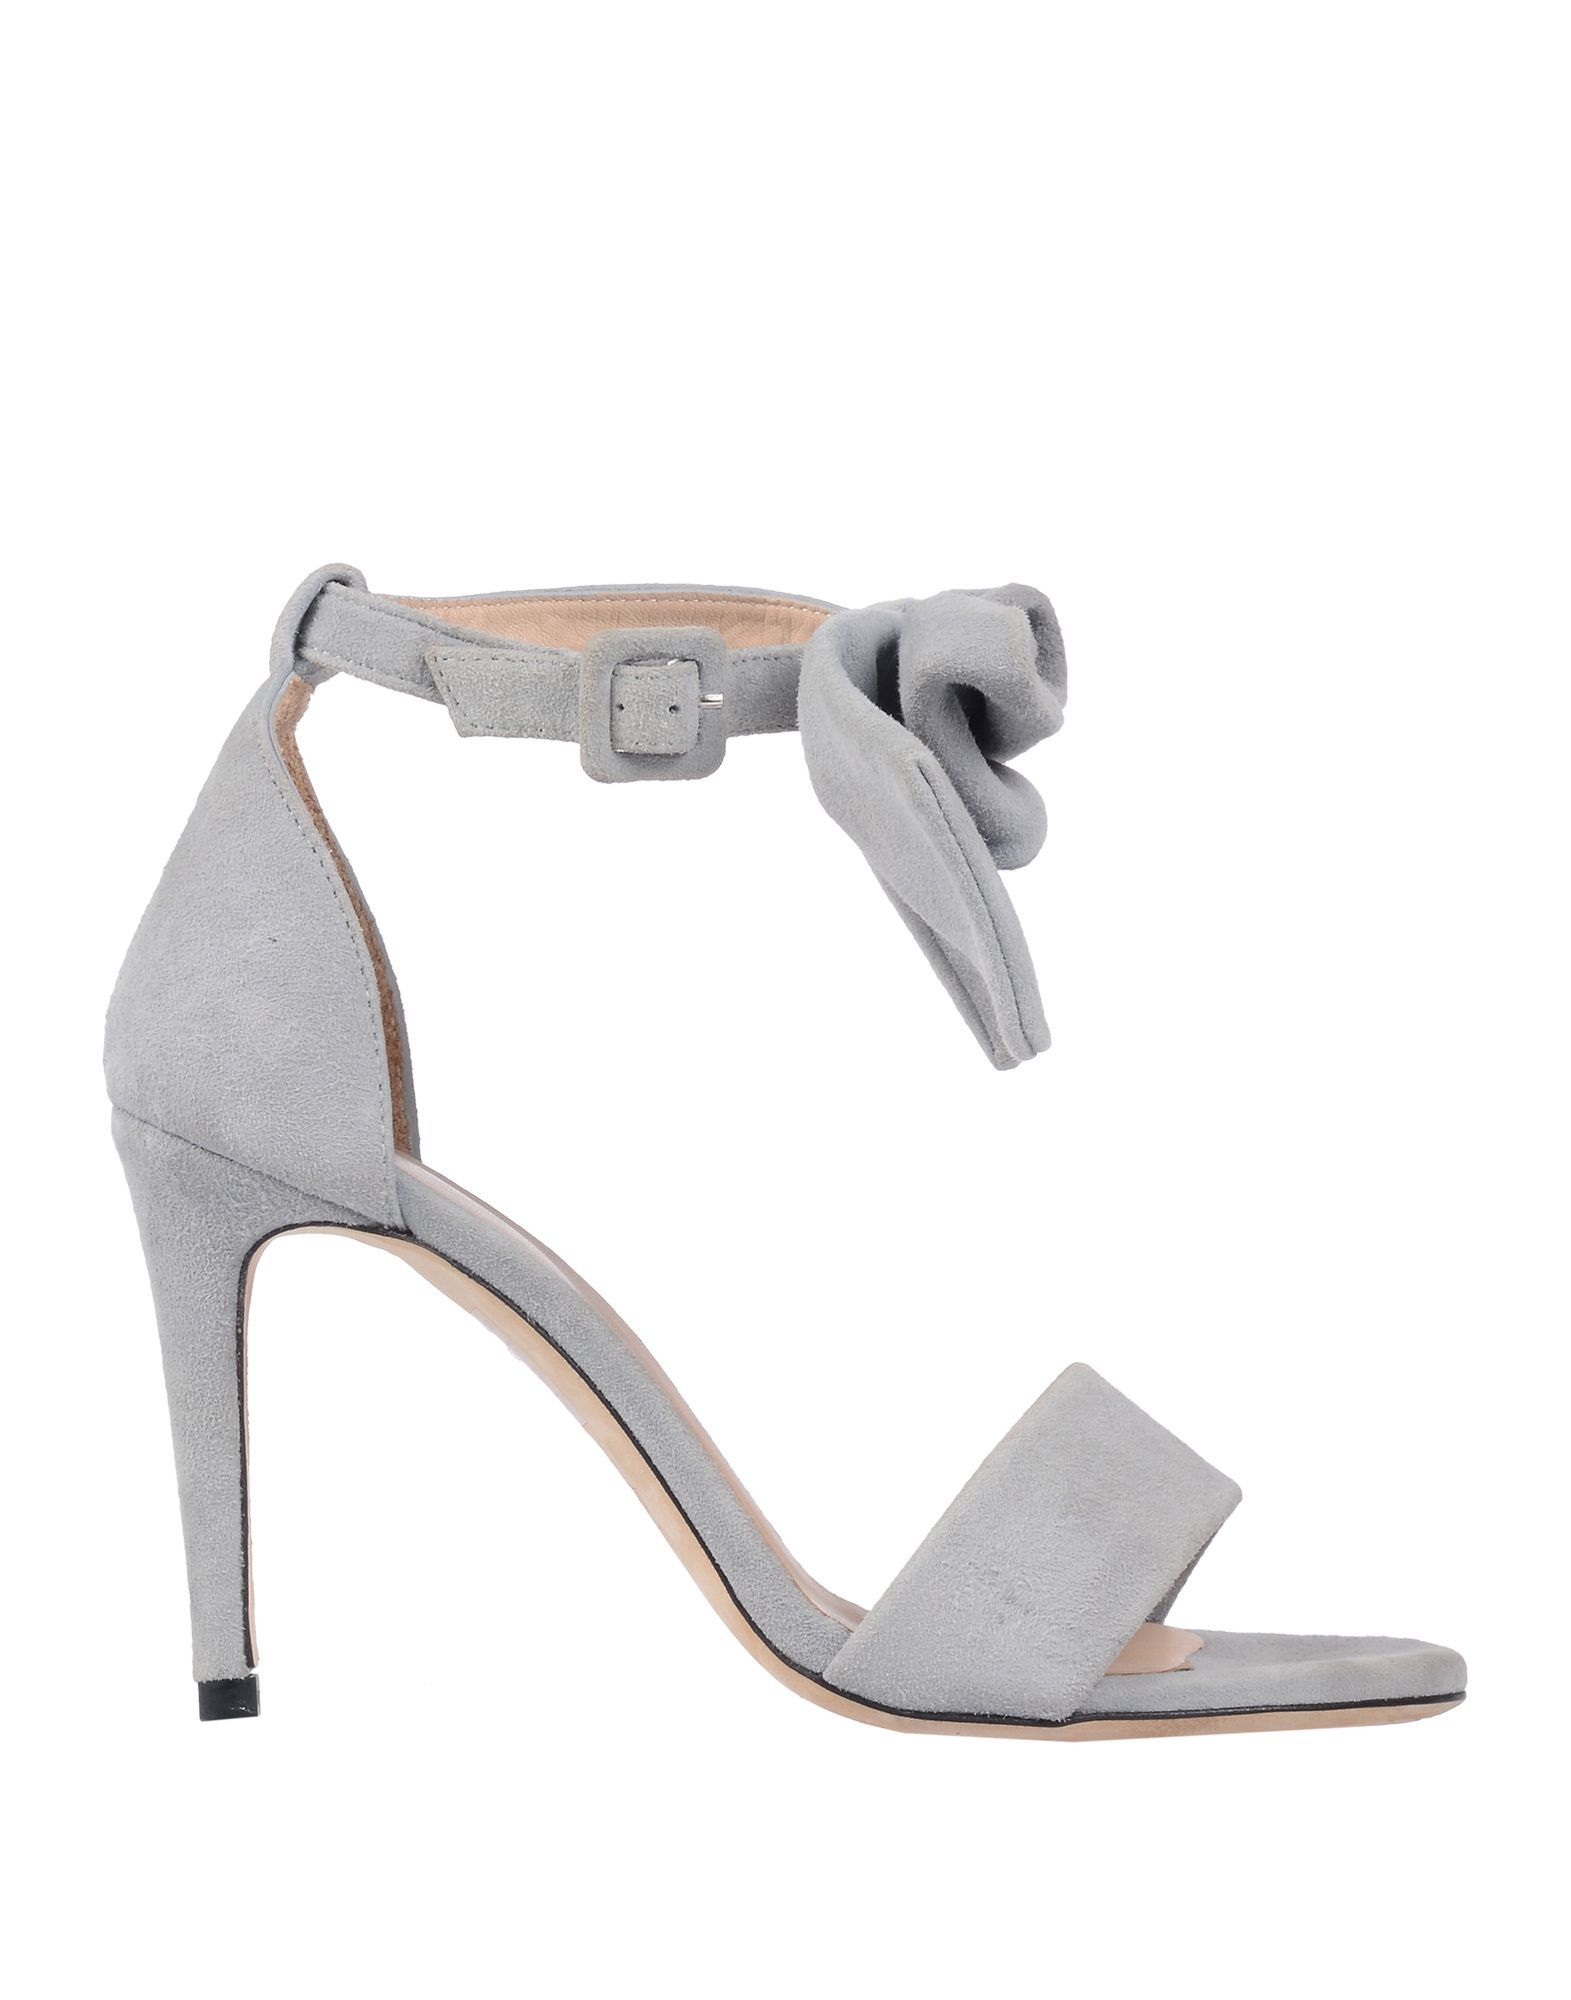 Paul & Joe Grey Leather Sandals